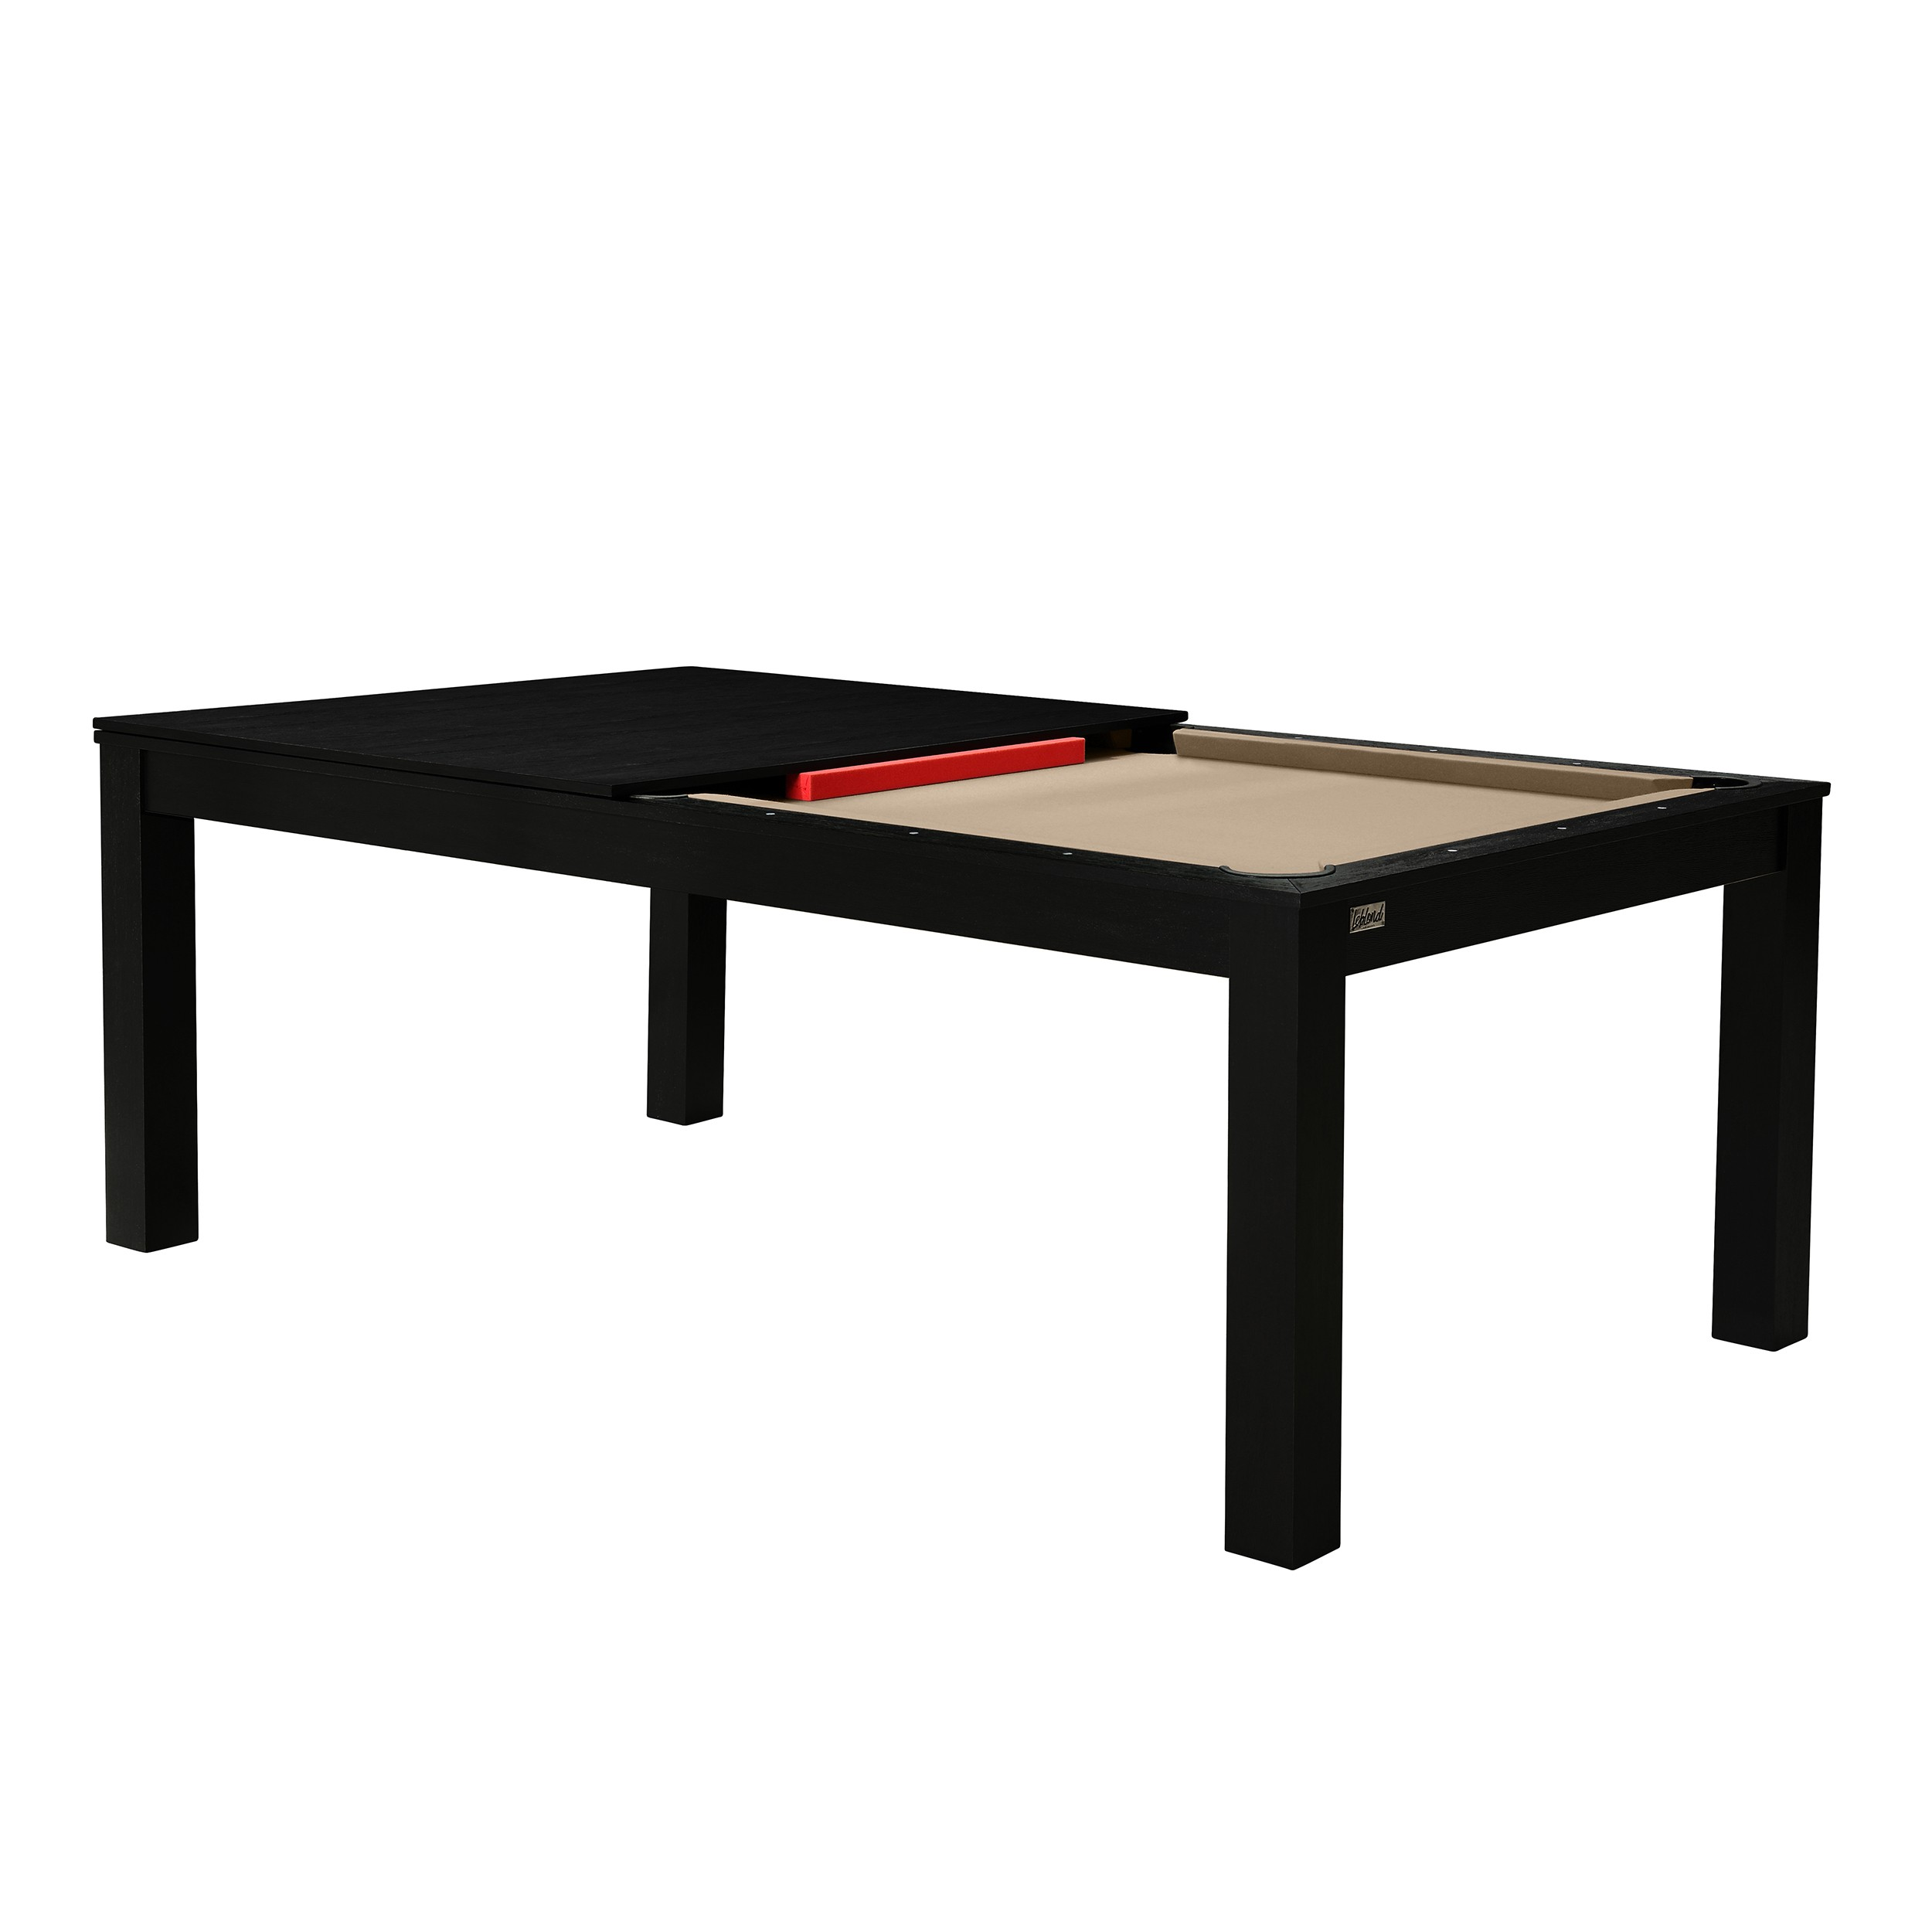 billard table convertible noir tapis beige achetez les billard table convertible noir tapis. Black Bedroom Furniture Sets. Home Design Ideas